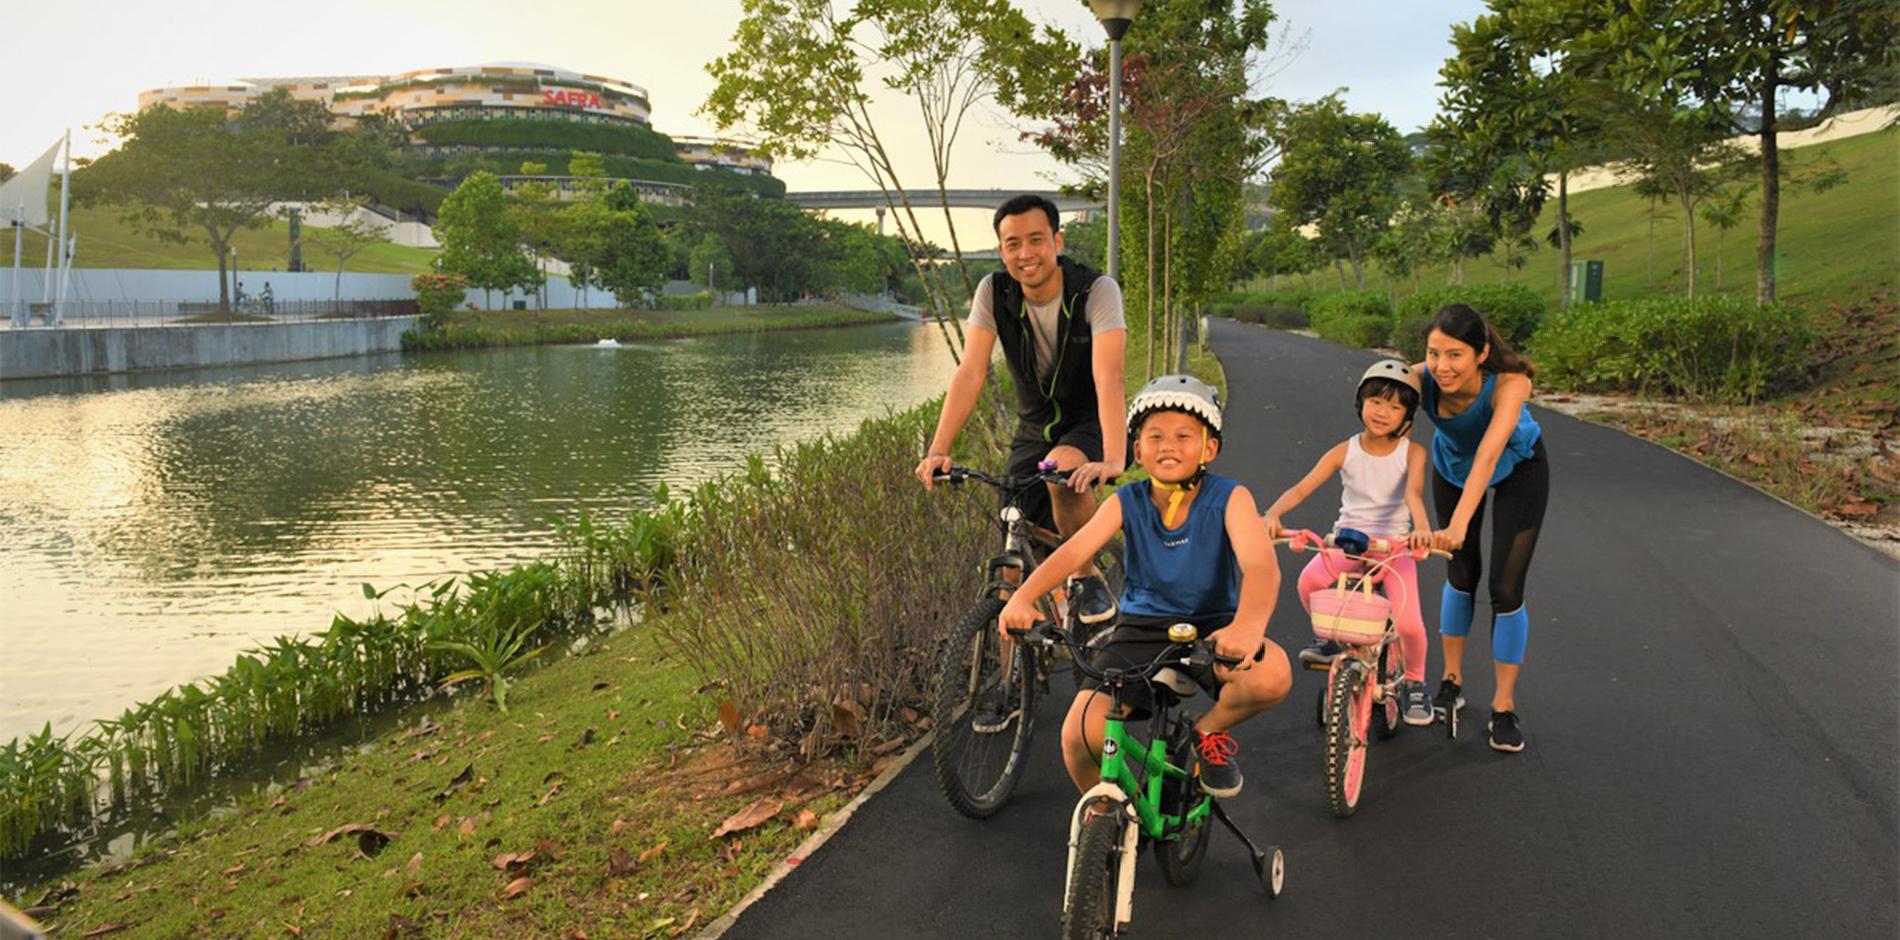 1900x940 pg family cycling